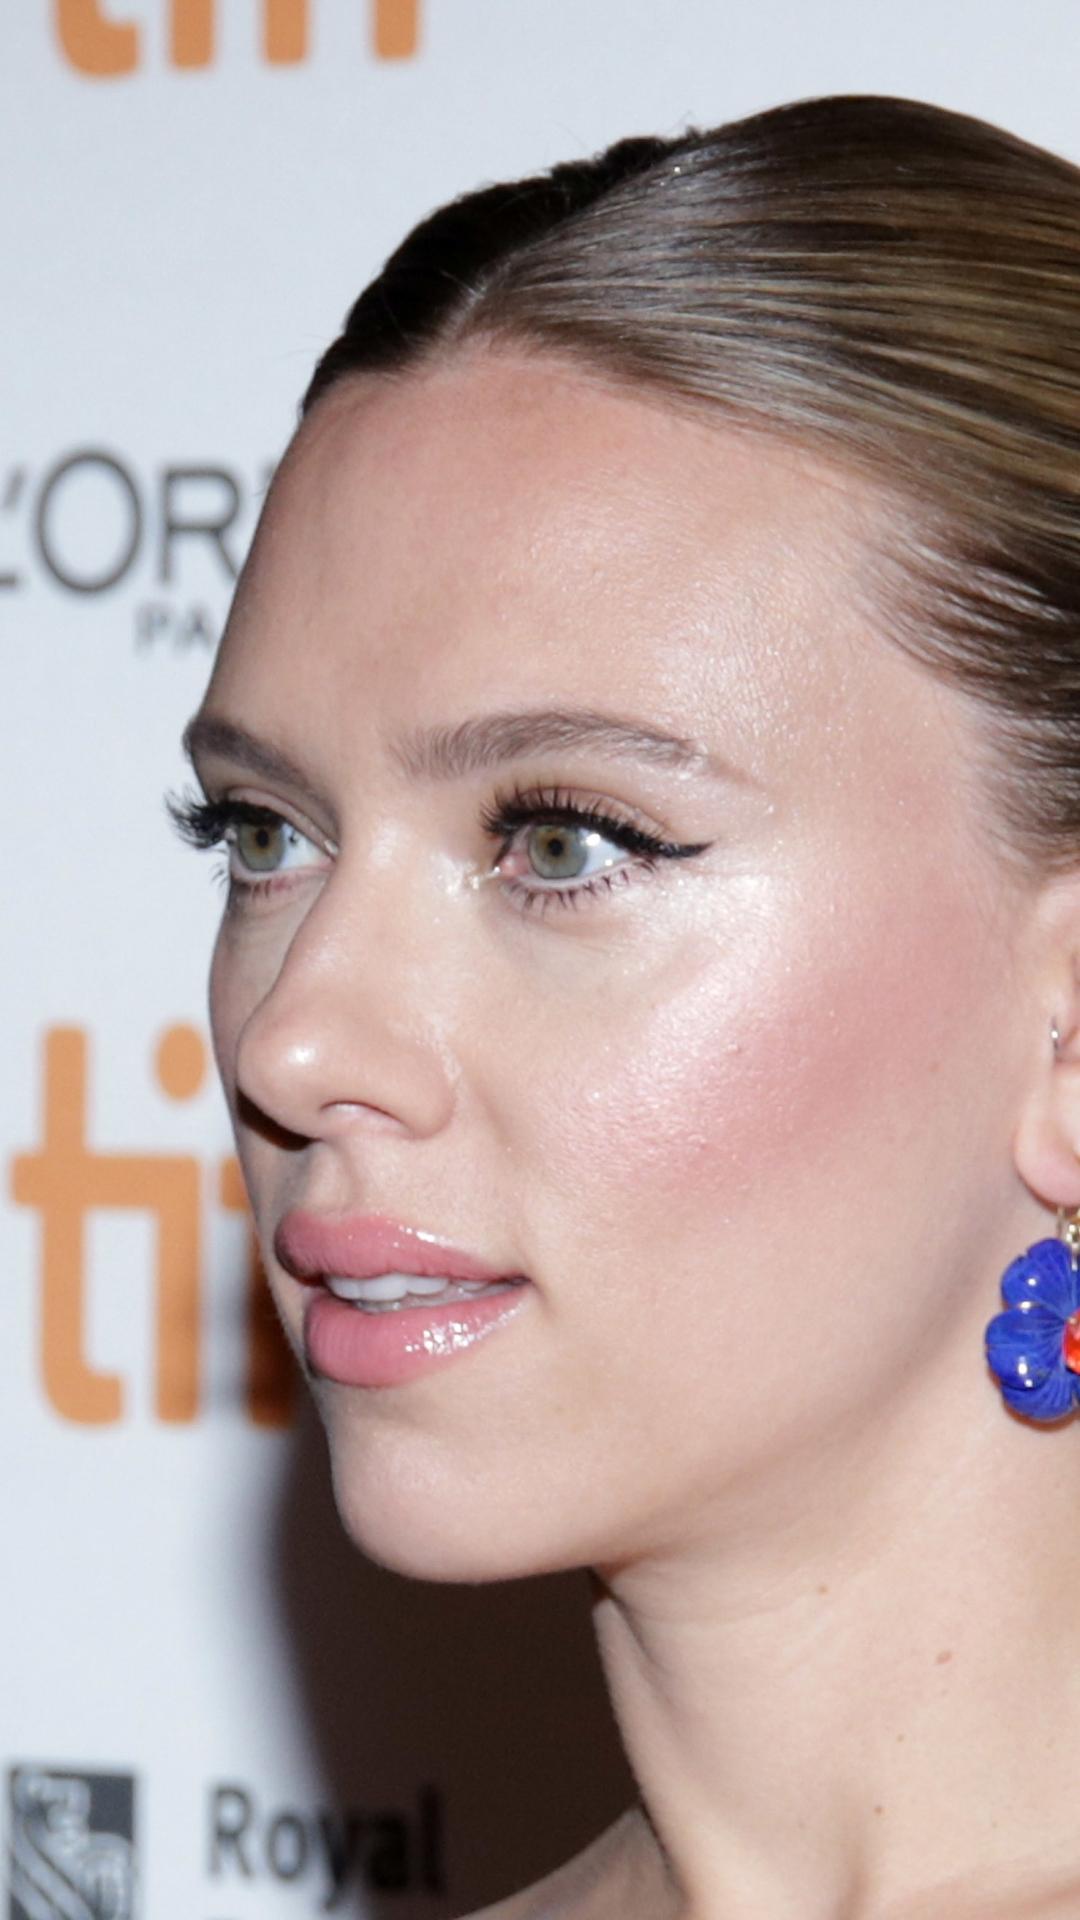 Celebrity Scarlett Johansson 1080x1920 Wallpaper Id 848891 Mobile Abyss